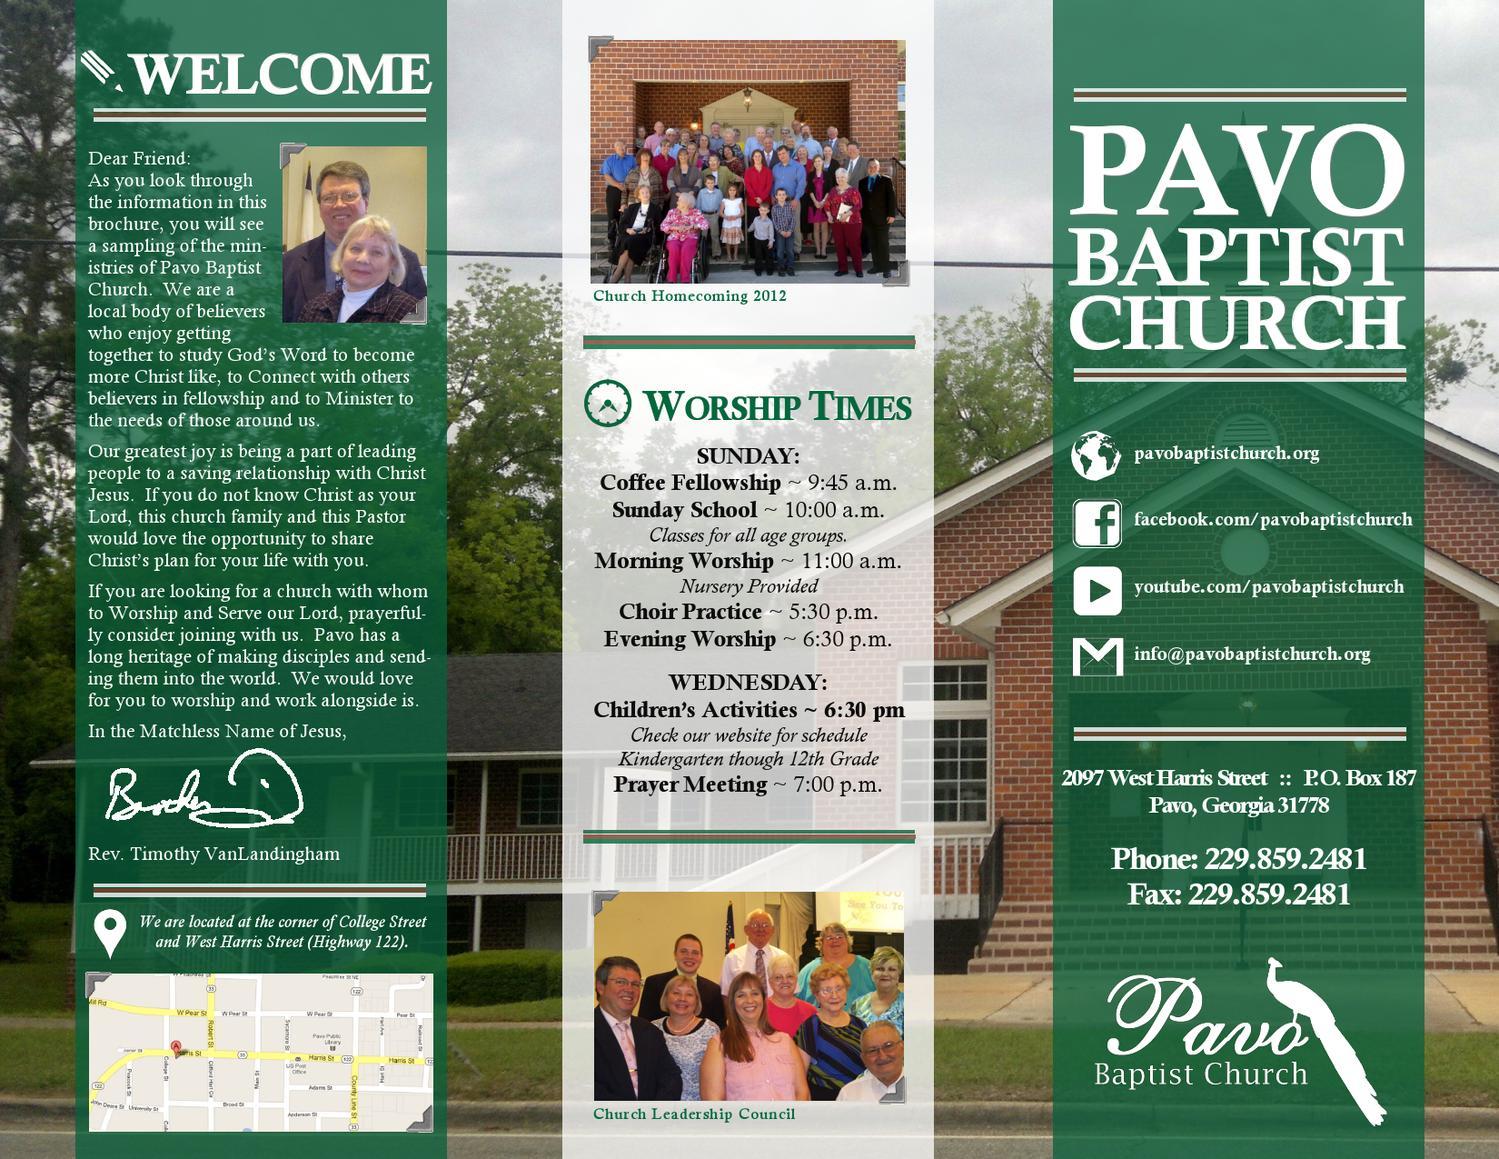 pavo baptist church brochure 2013 by pavo baptist church issuu